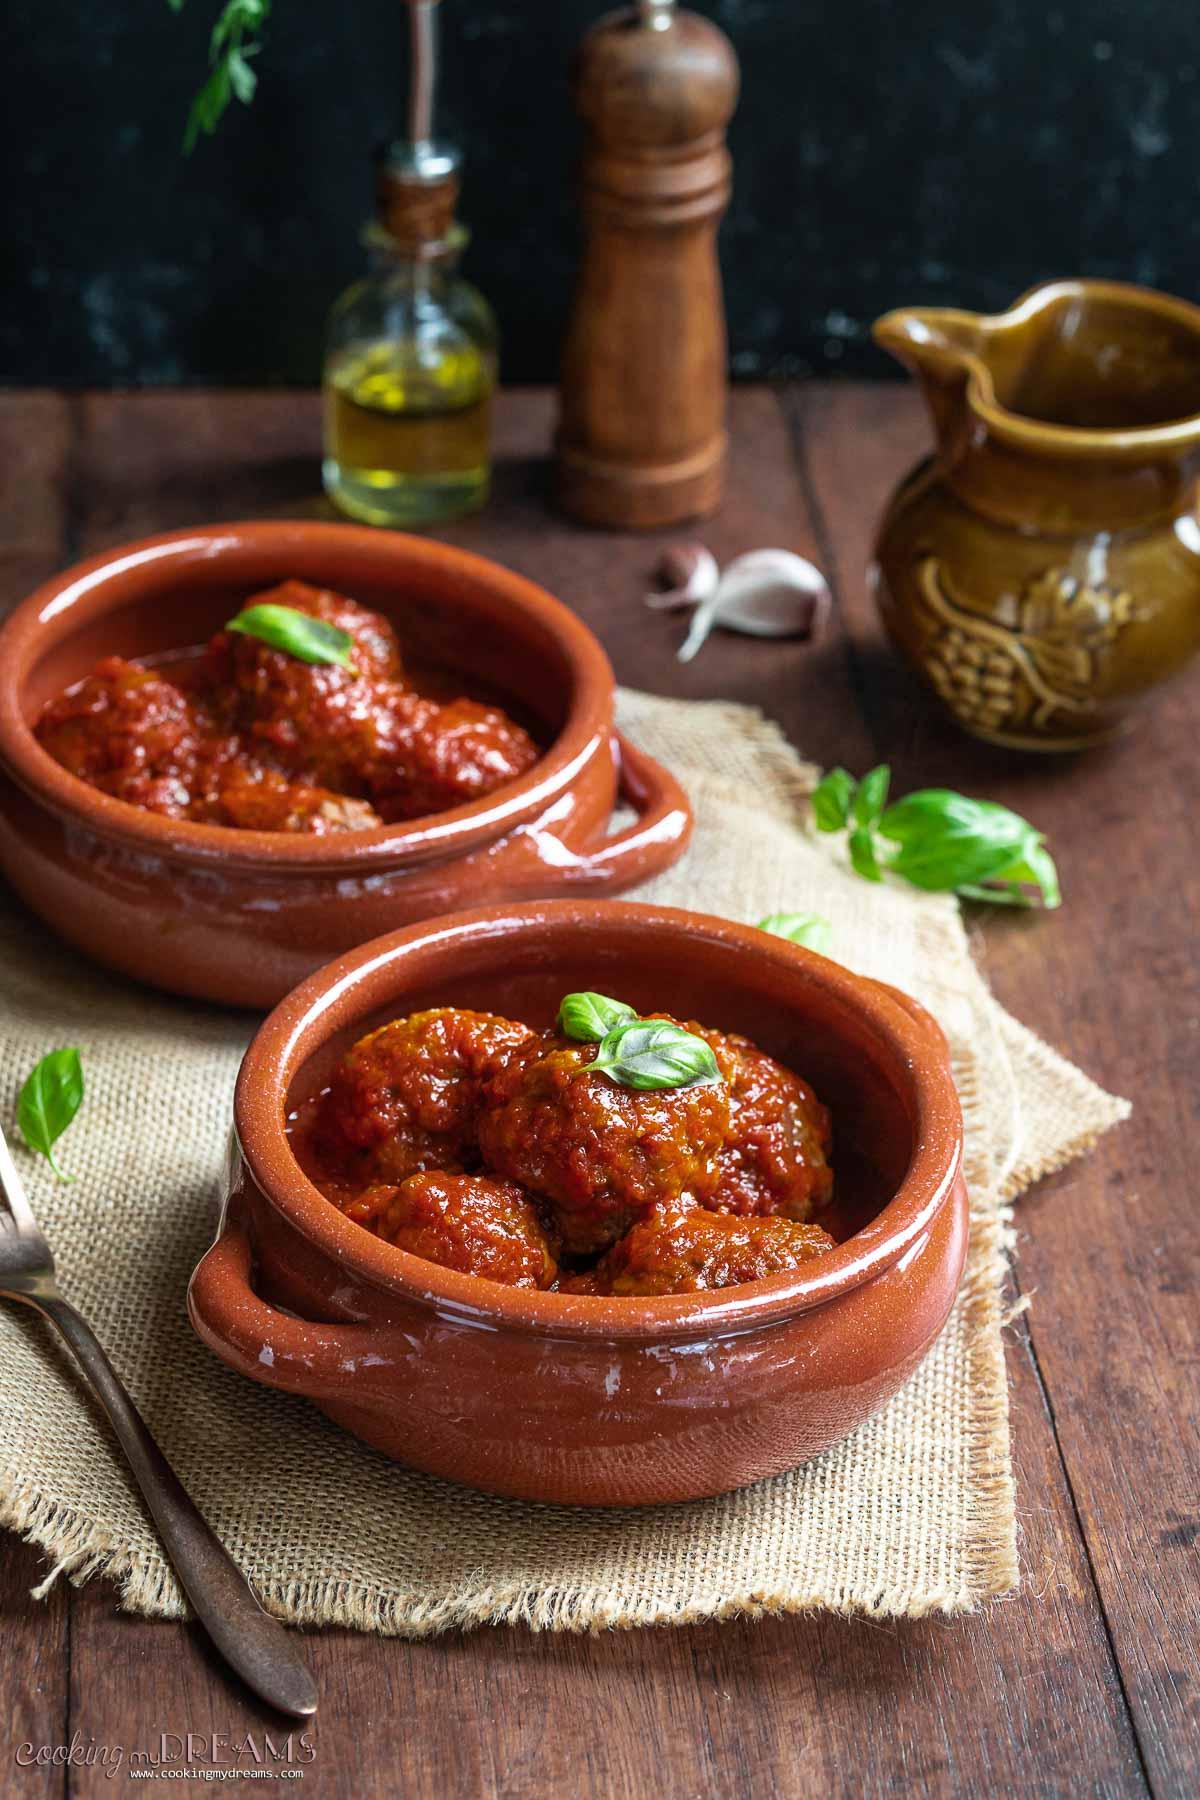 polpette al sugo served in terracotta bowls